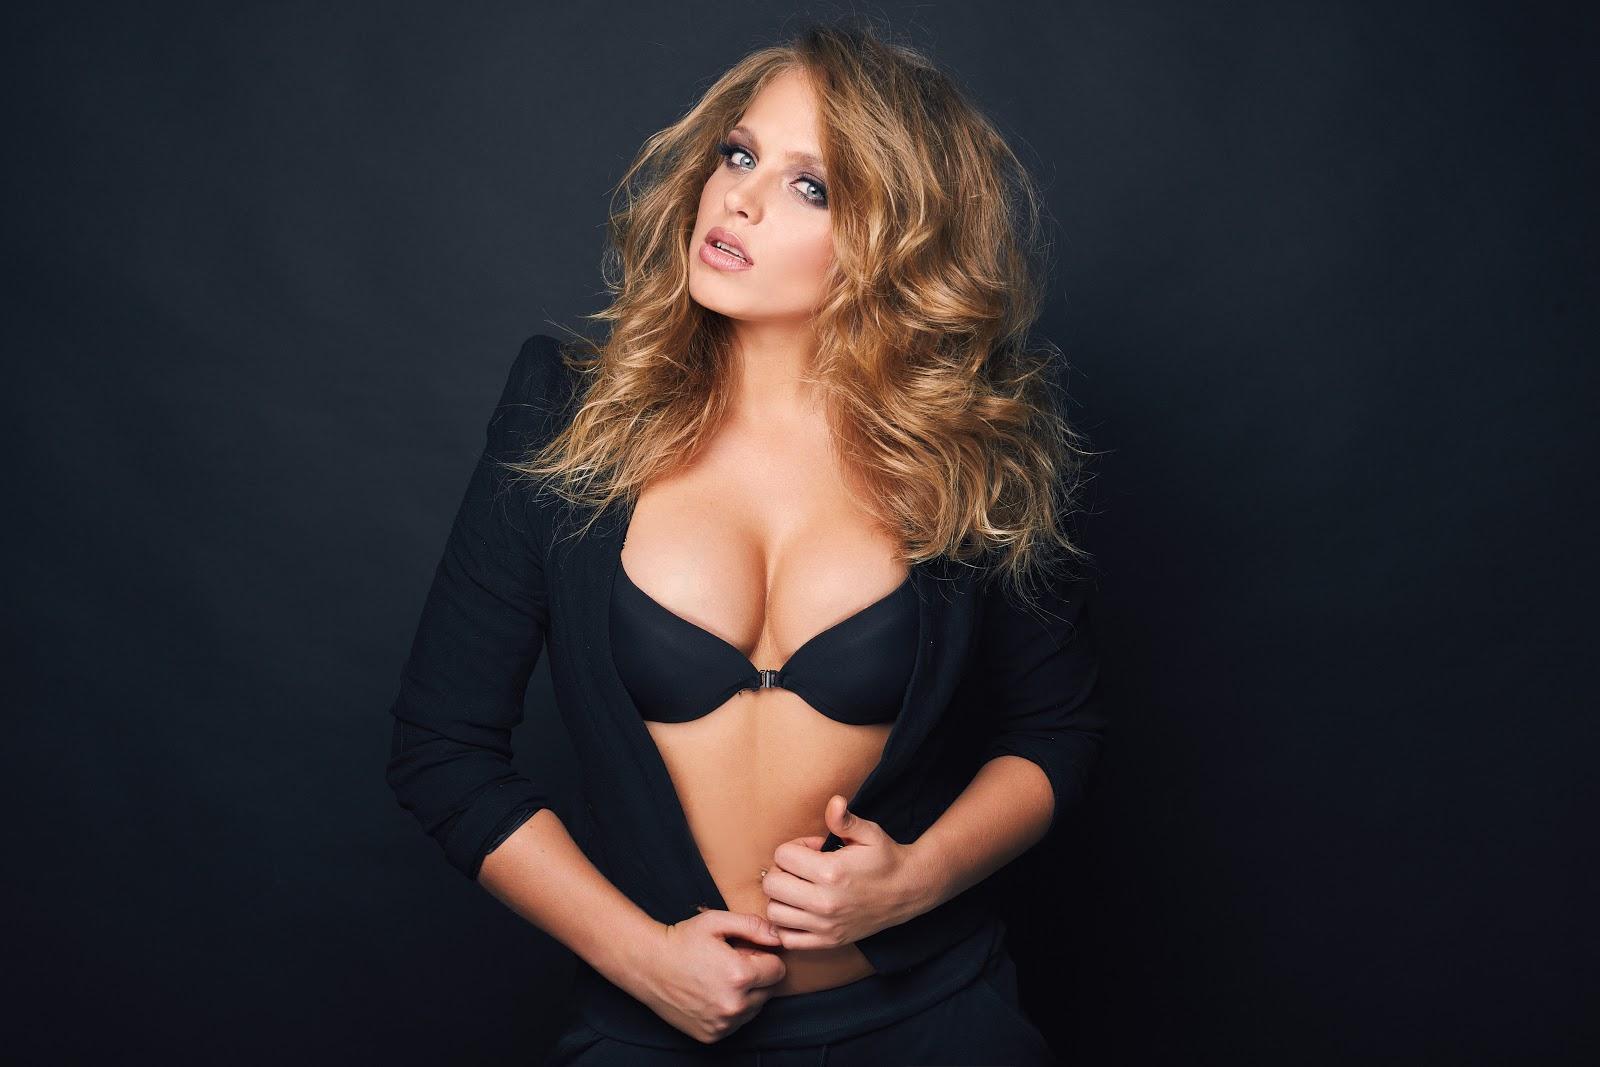 portrait of slavonic Russian beautiful blond sexy woman